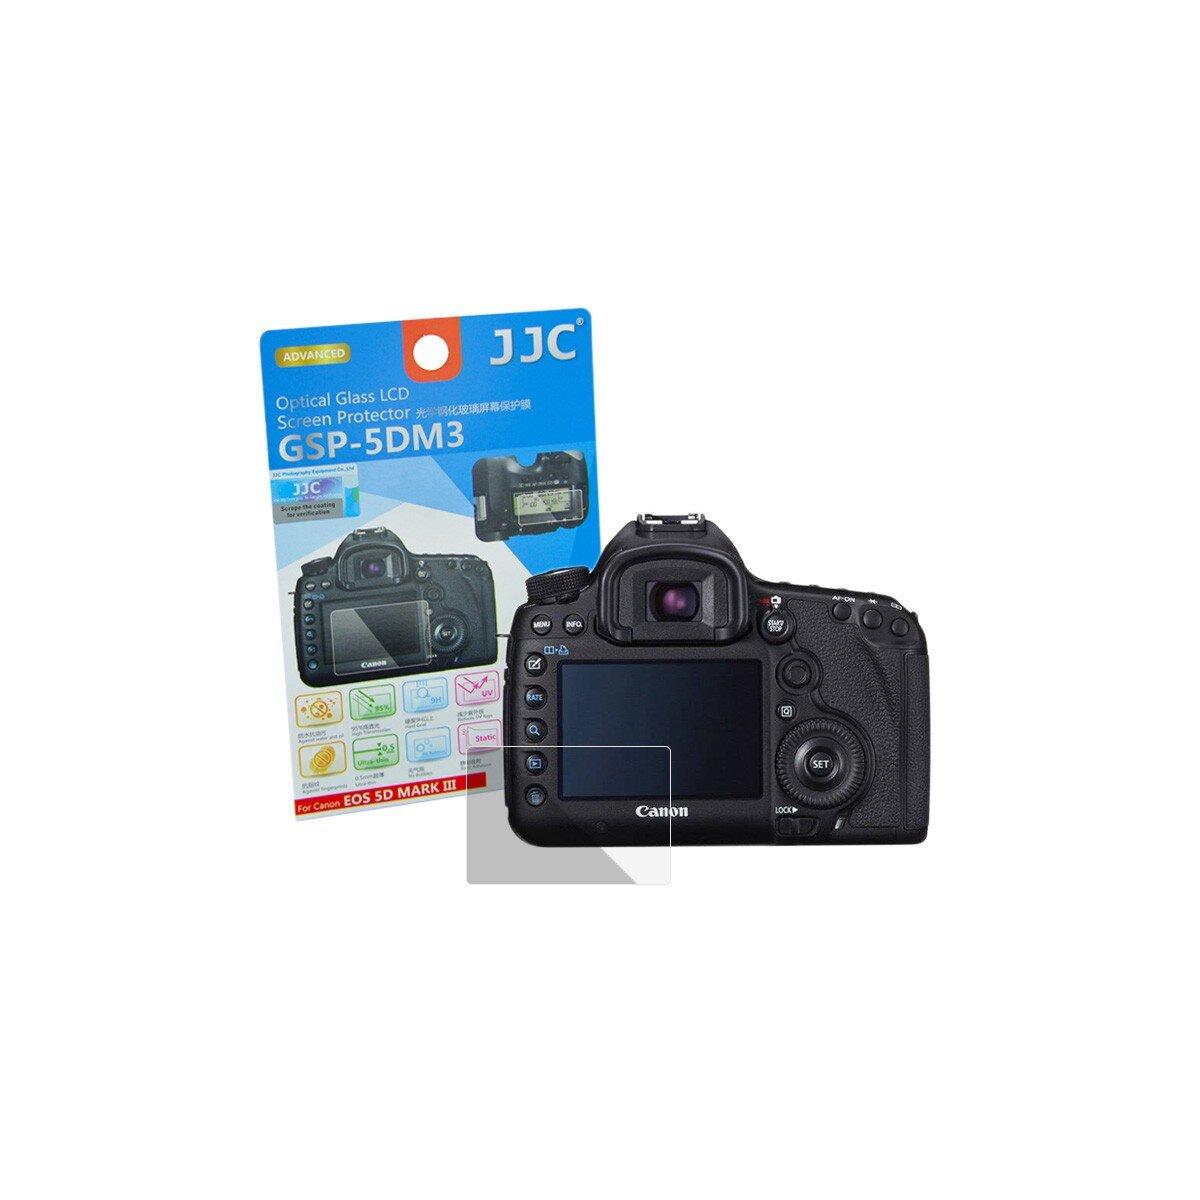 Hochwertiger Displayschutz Screen Protector aus gehaertetem Echtglas, passend fuer Canon EOS 5D Mark III